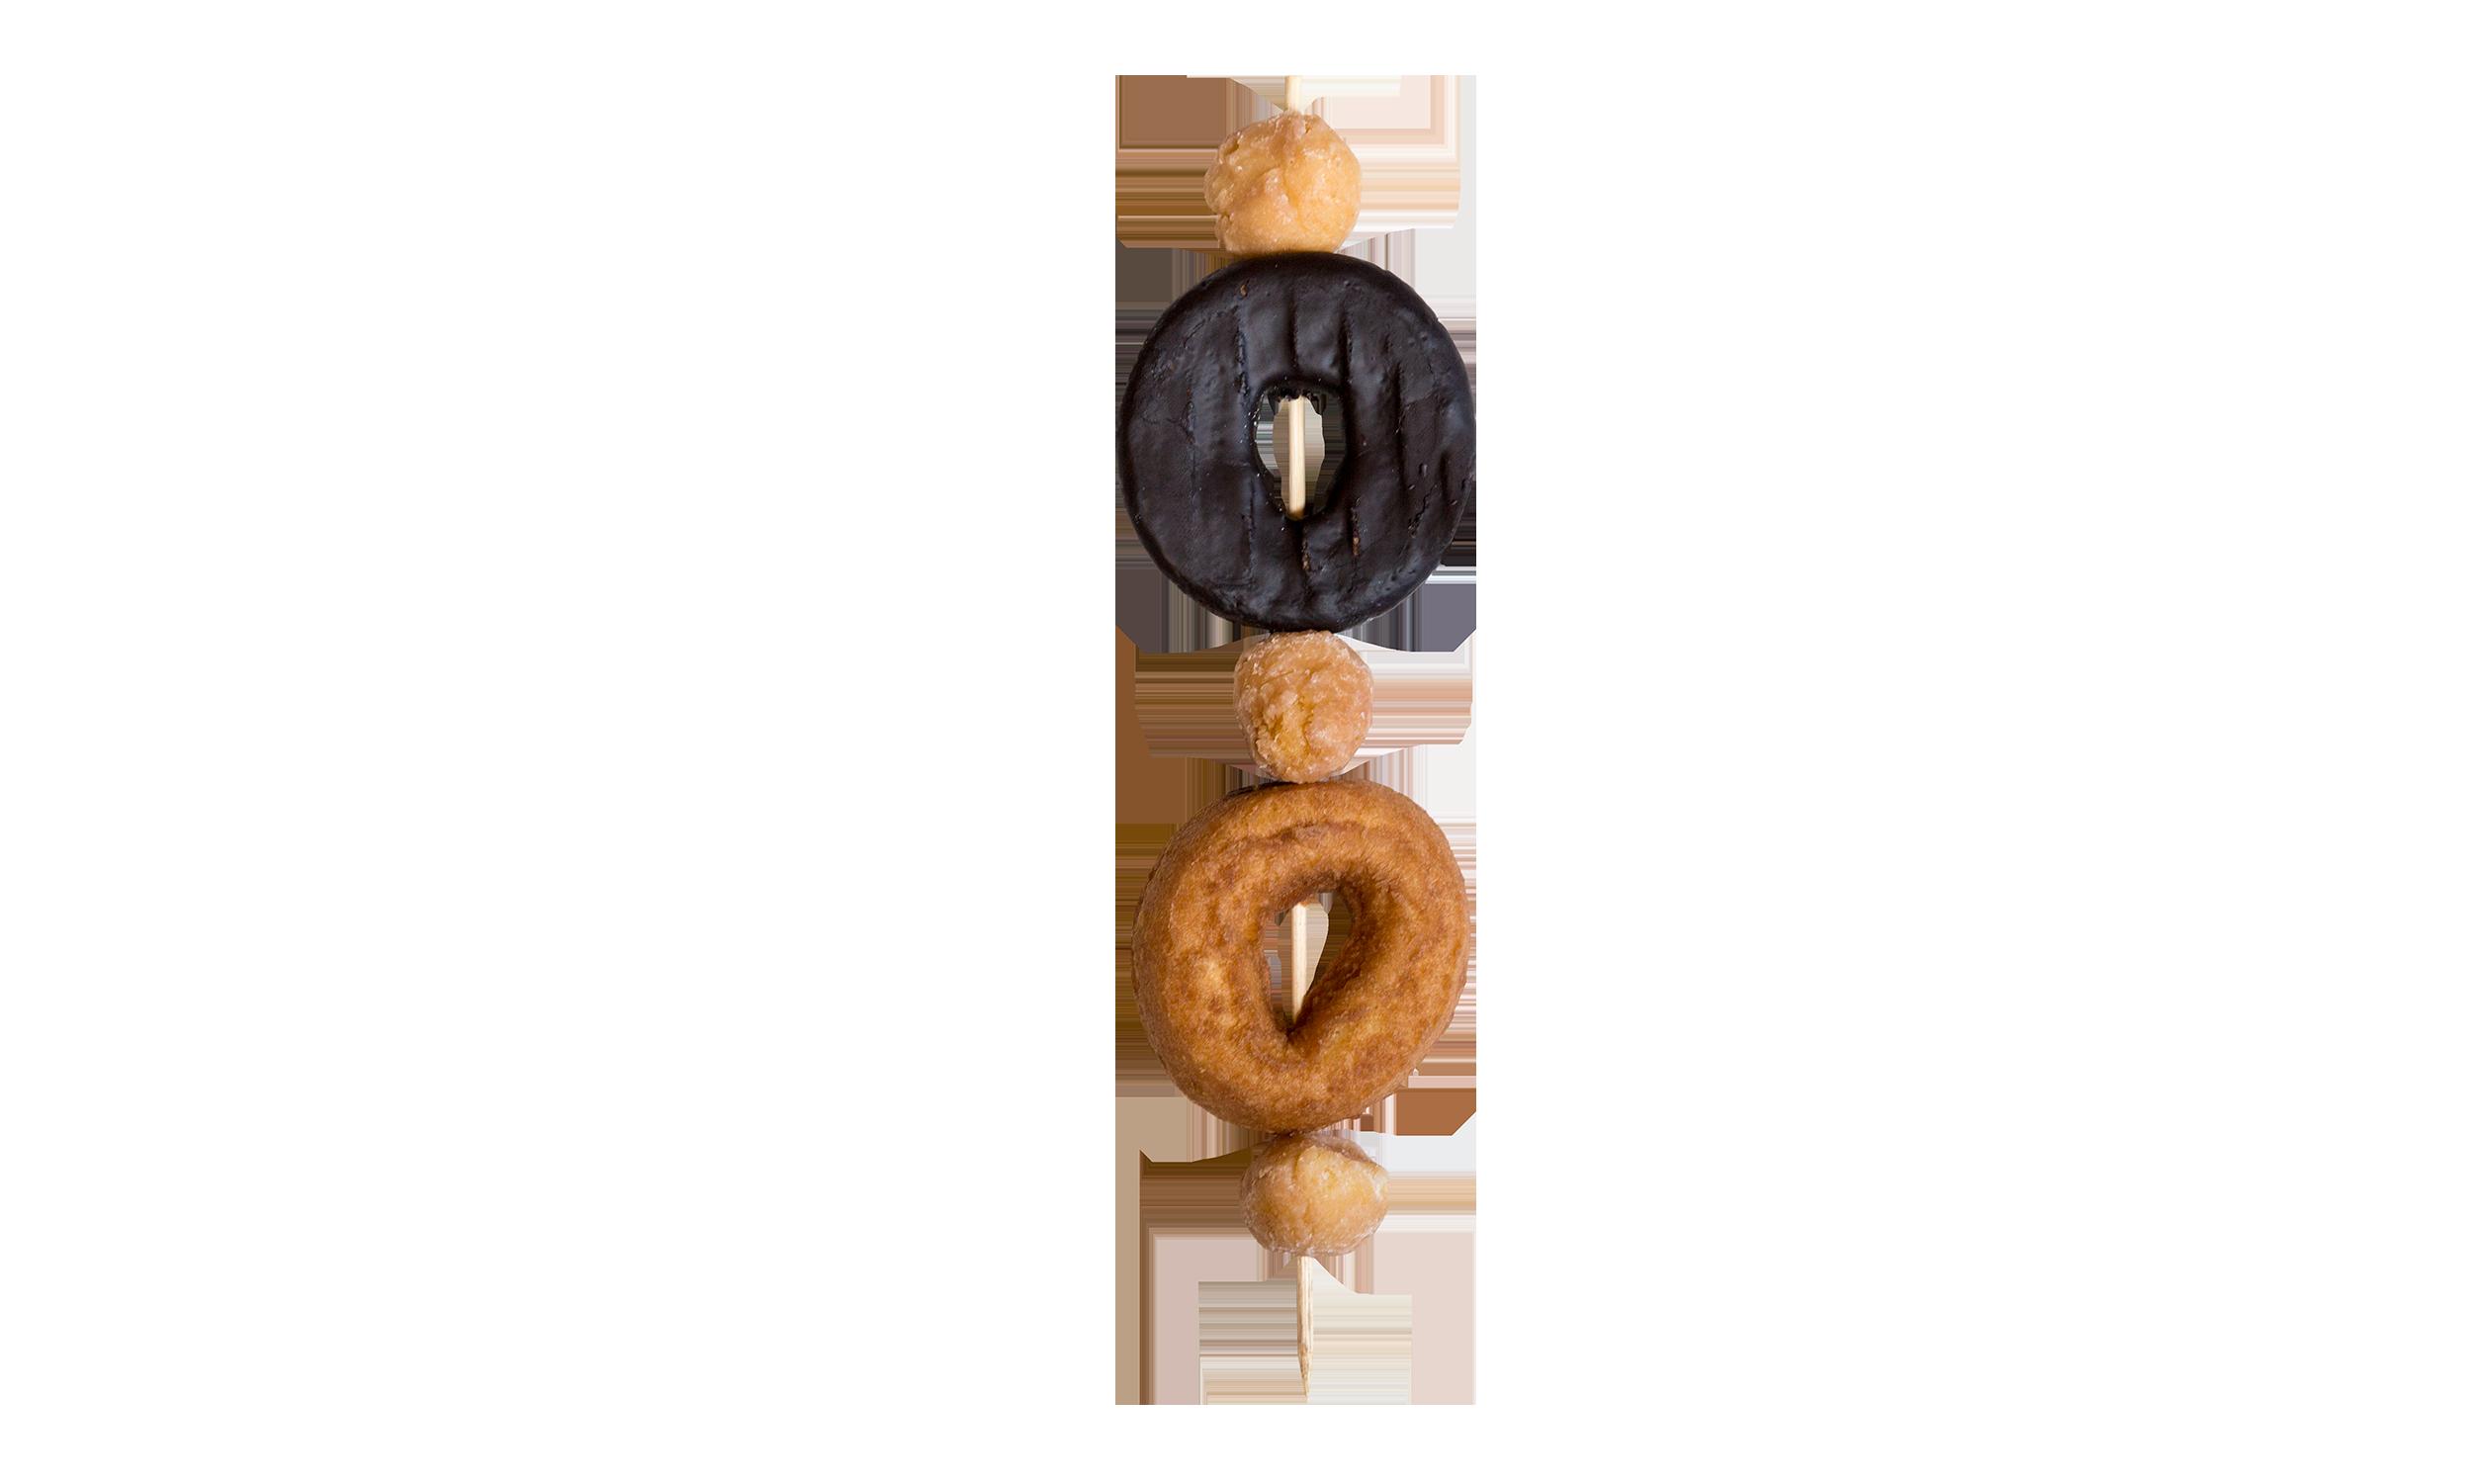 EC:  assets%2Fmessage-editor%2F1471982864260-doughnuts-stick